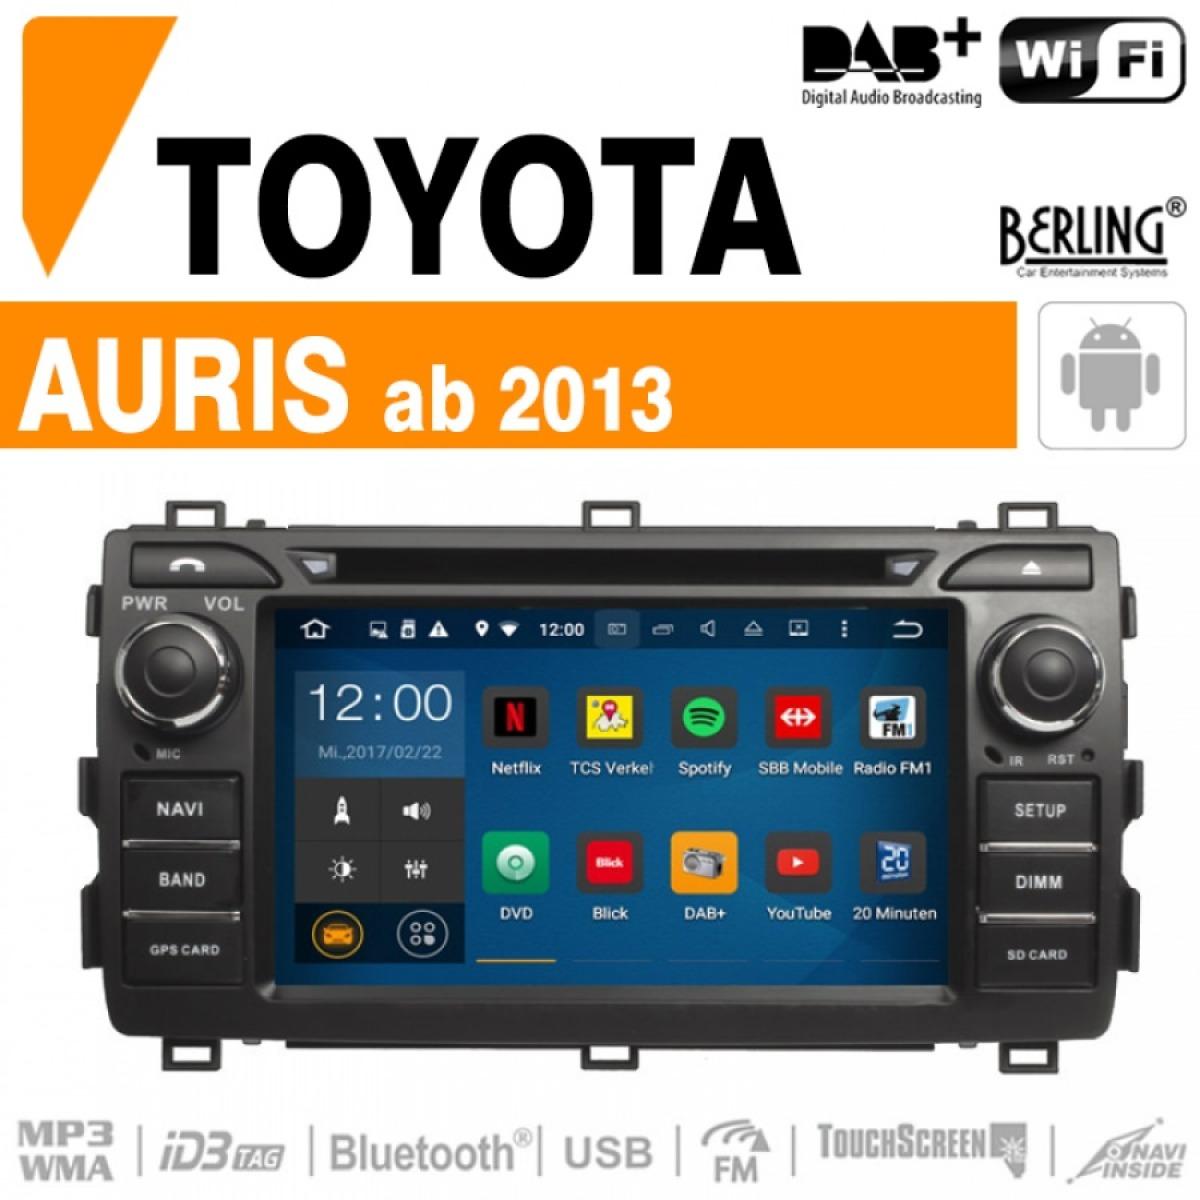 autoradio navigation f r toyota berling ts 1236hd android version auris car gmbh. Black Bedroom Furniture Sets. Home Design Ideas